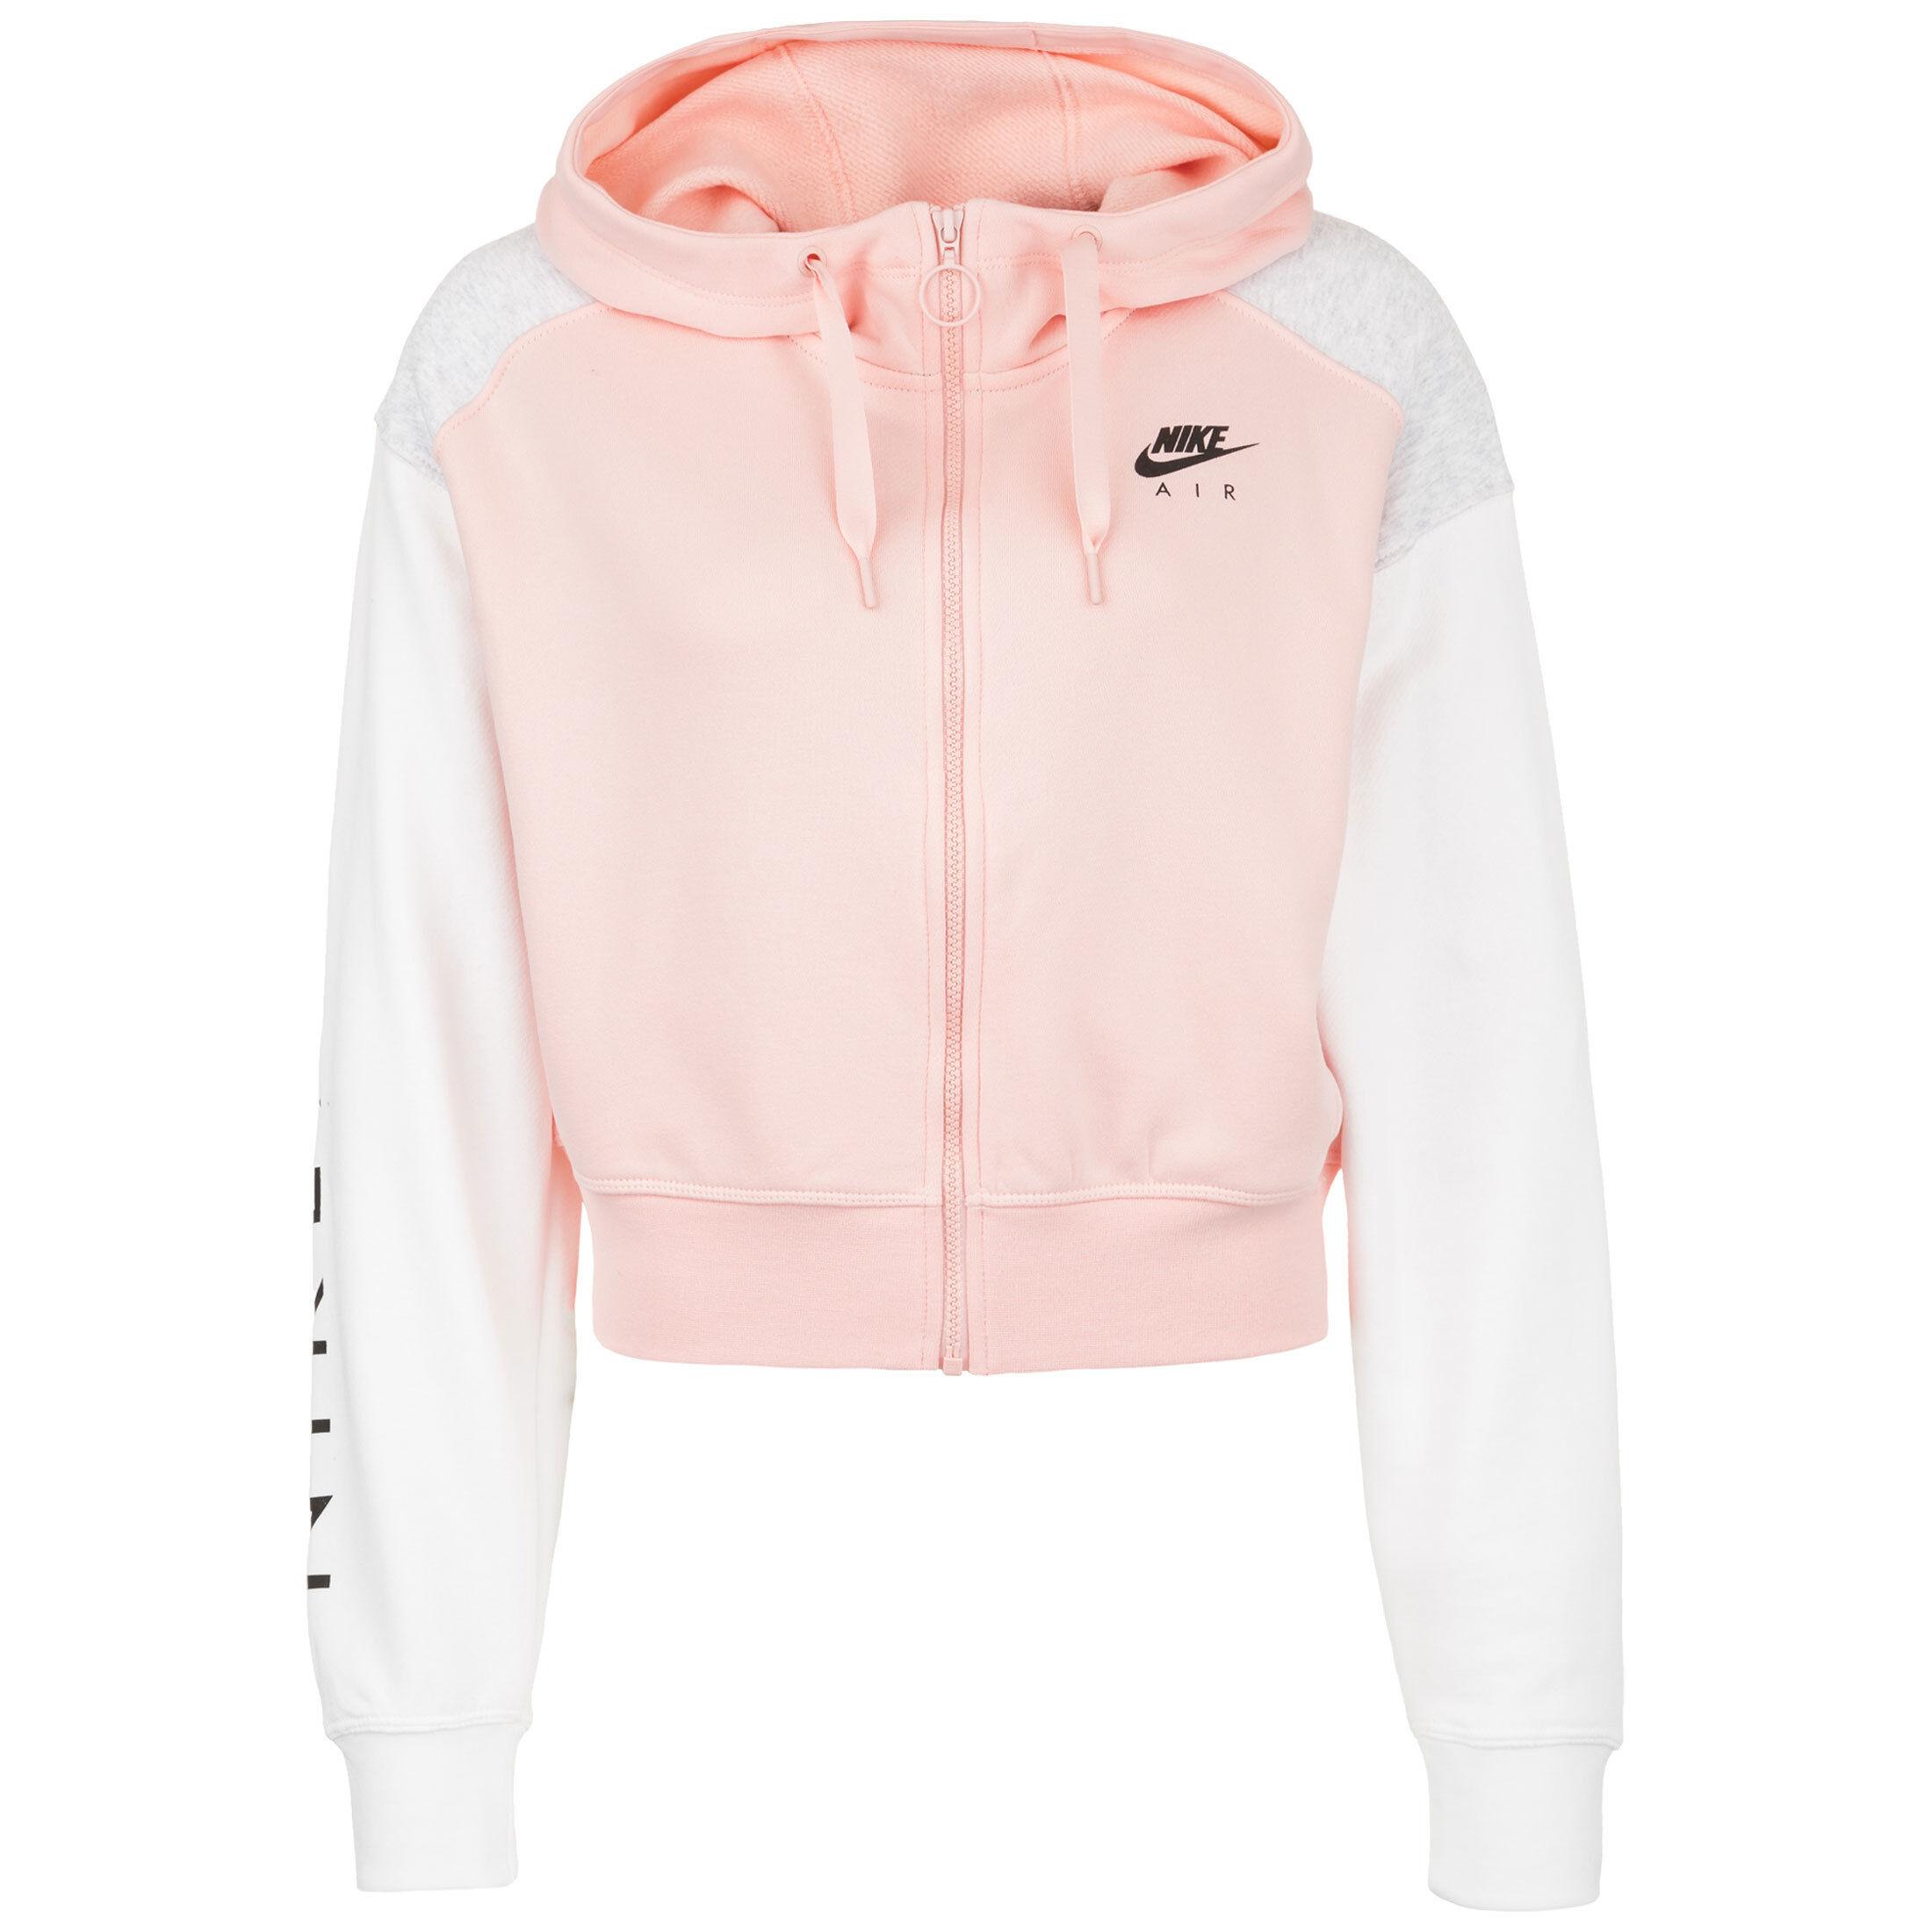 Bekleidung Damen Pink | Frauen Lifestyle bei OUTFITTER